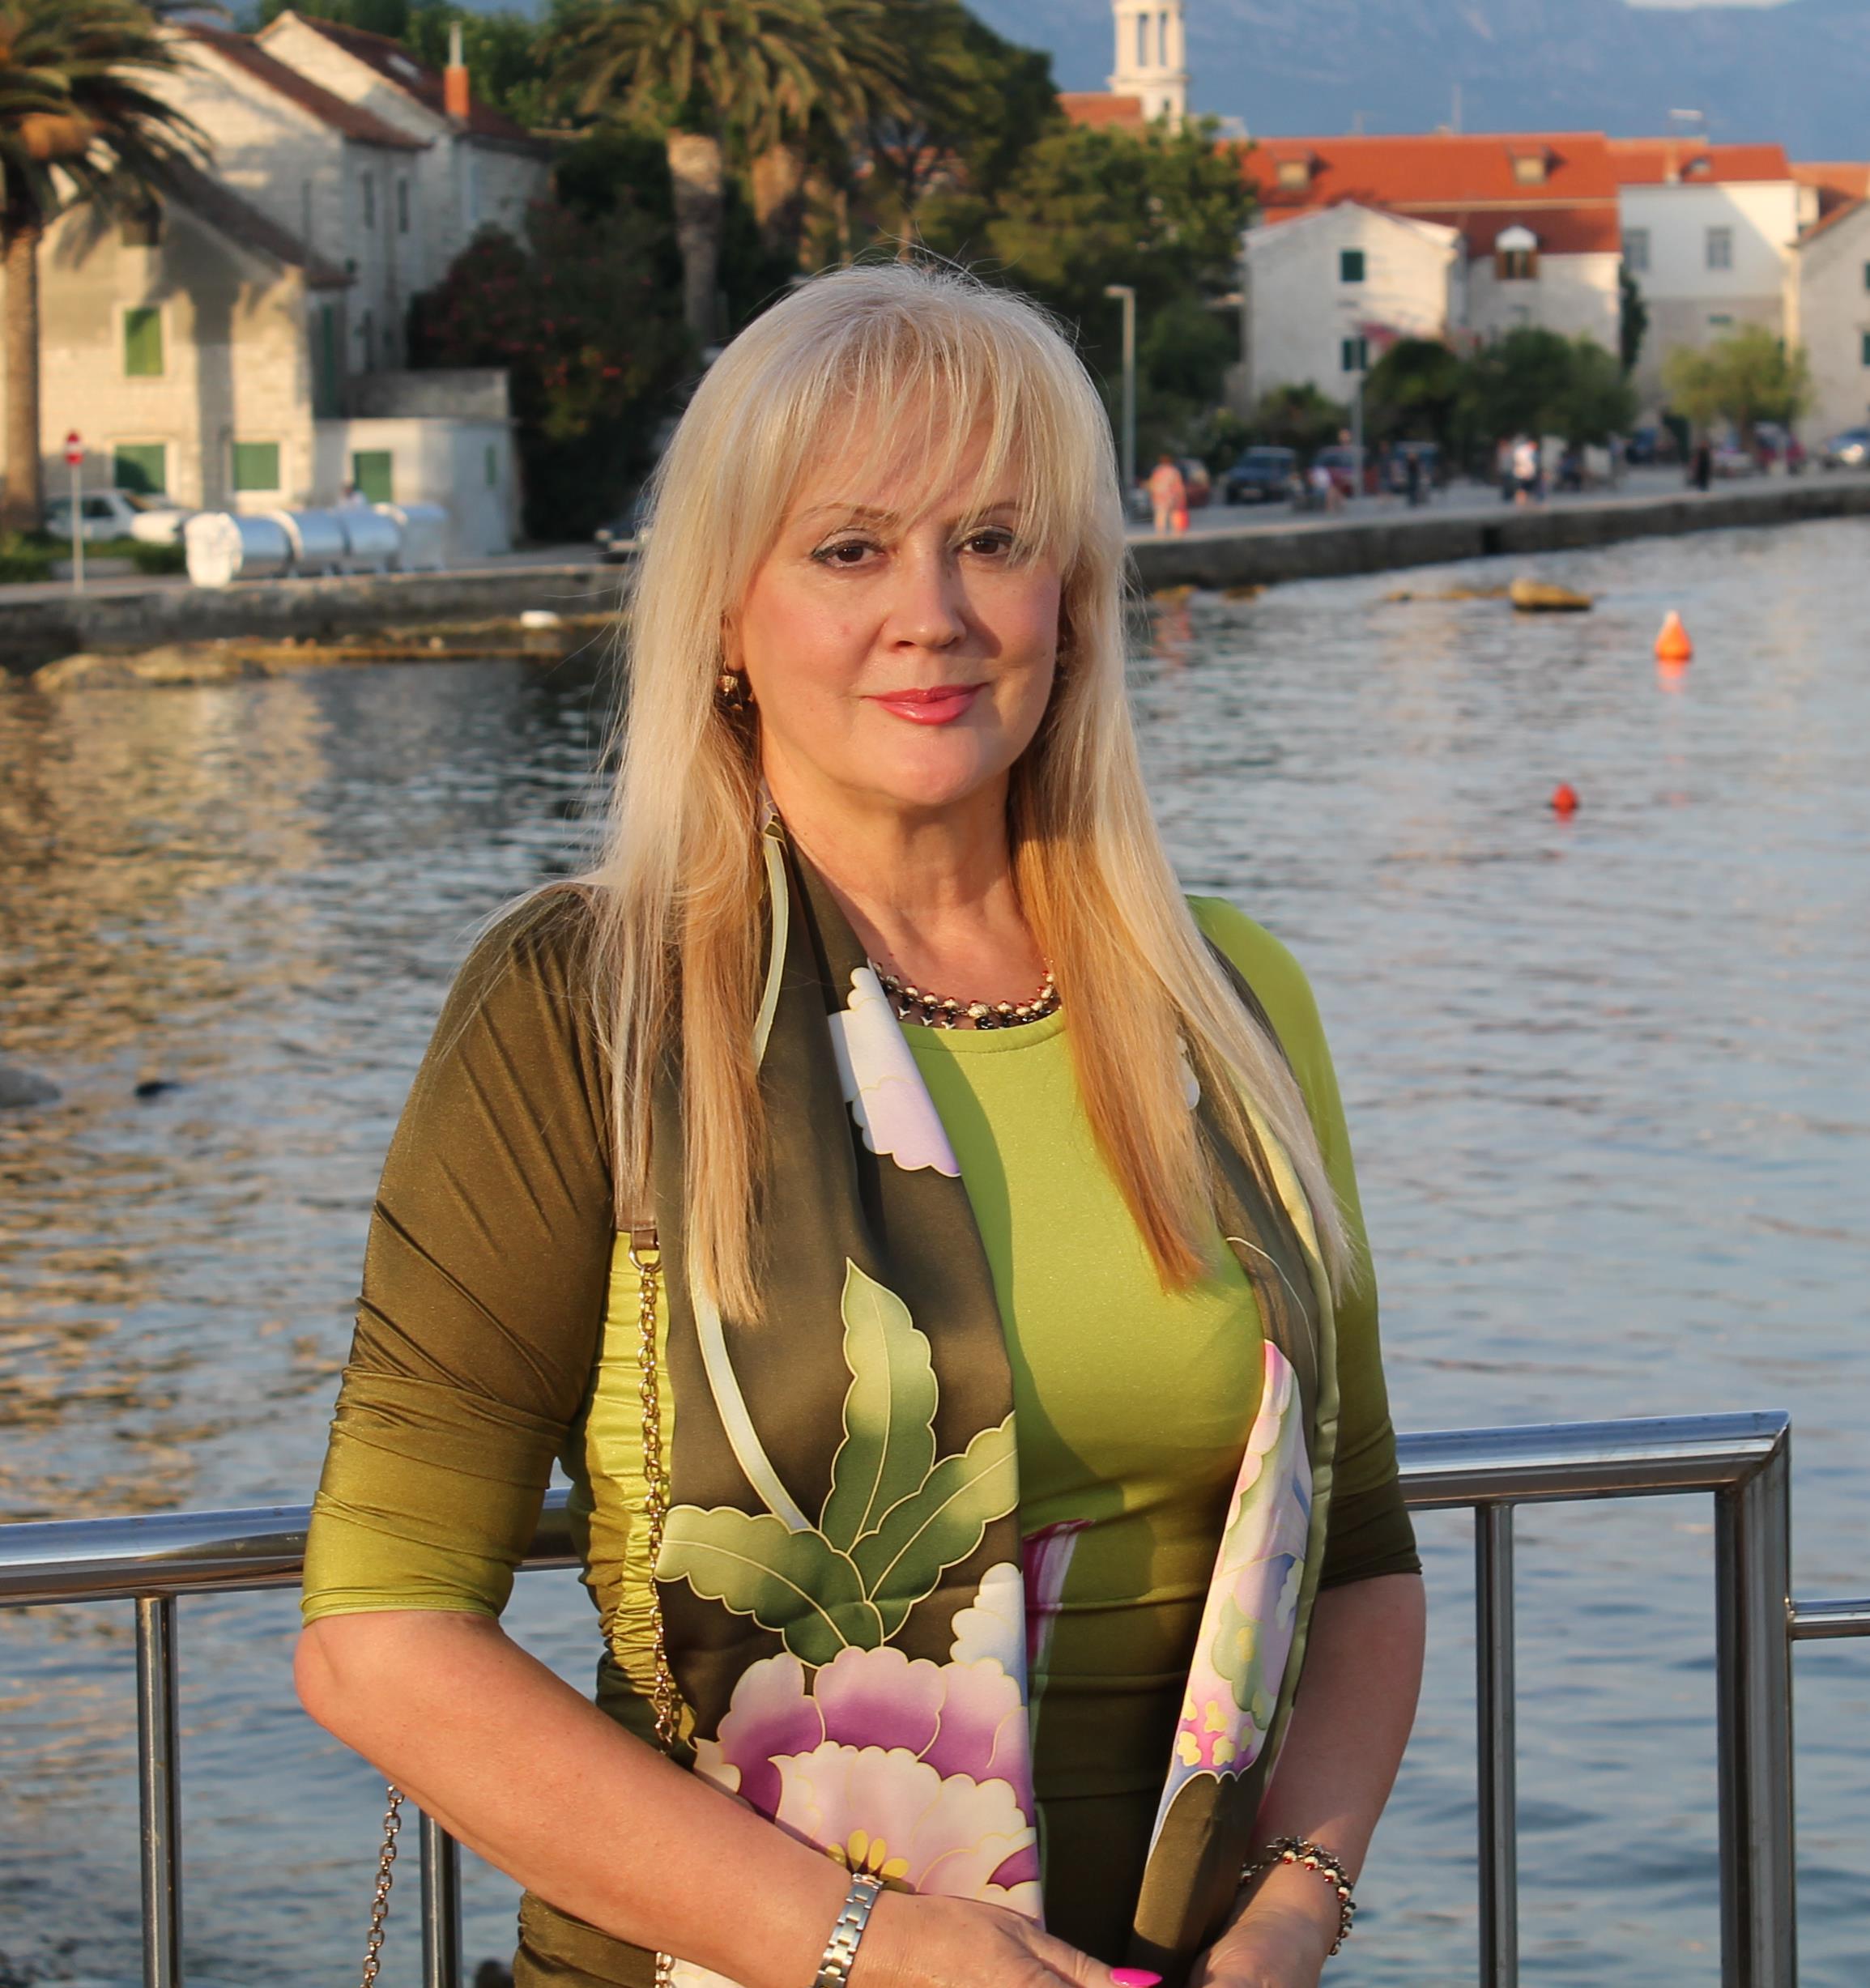 Zadar oglasi osobni kontakti - Datiranje za seks